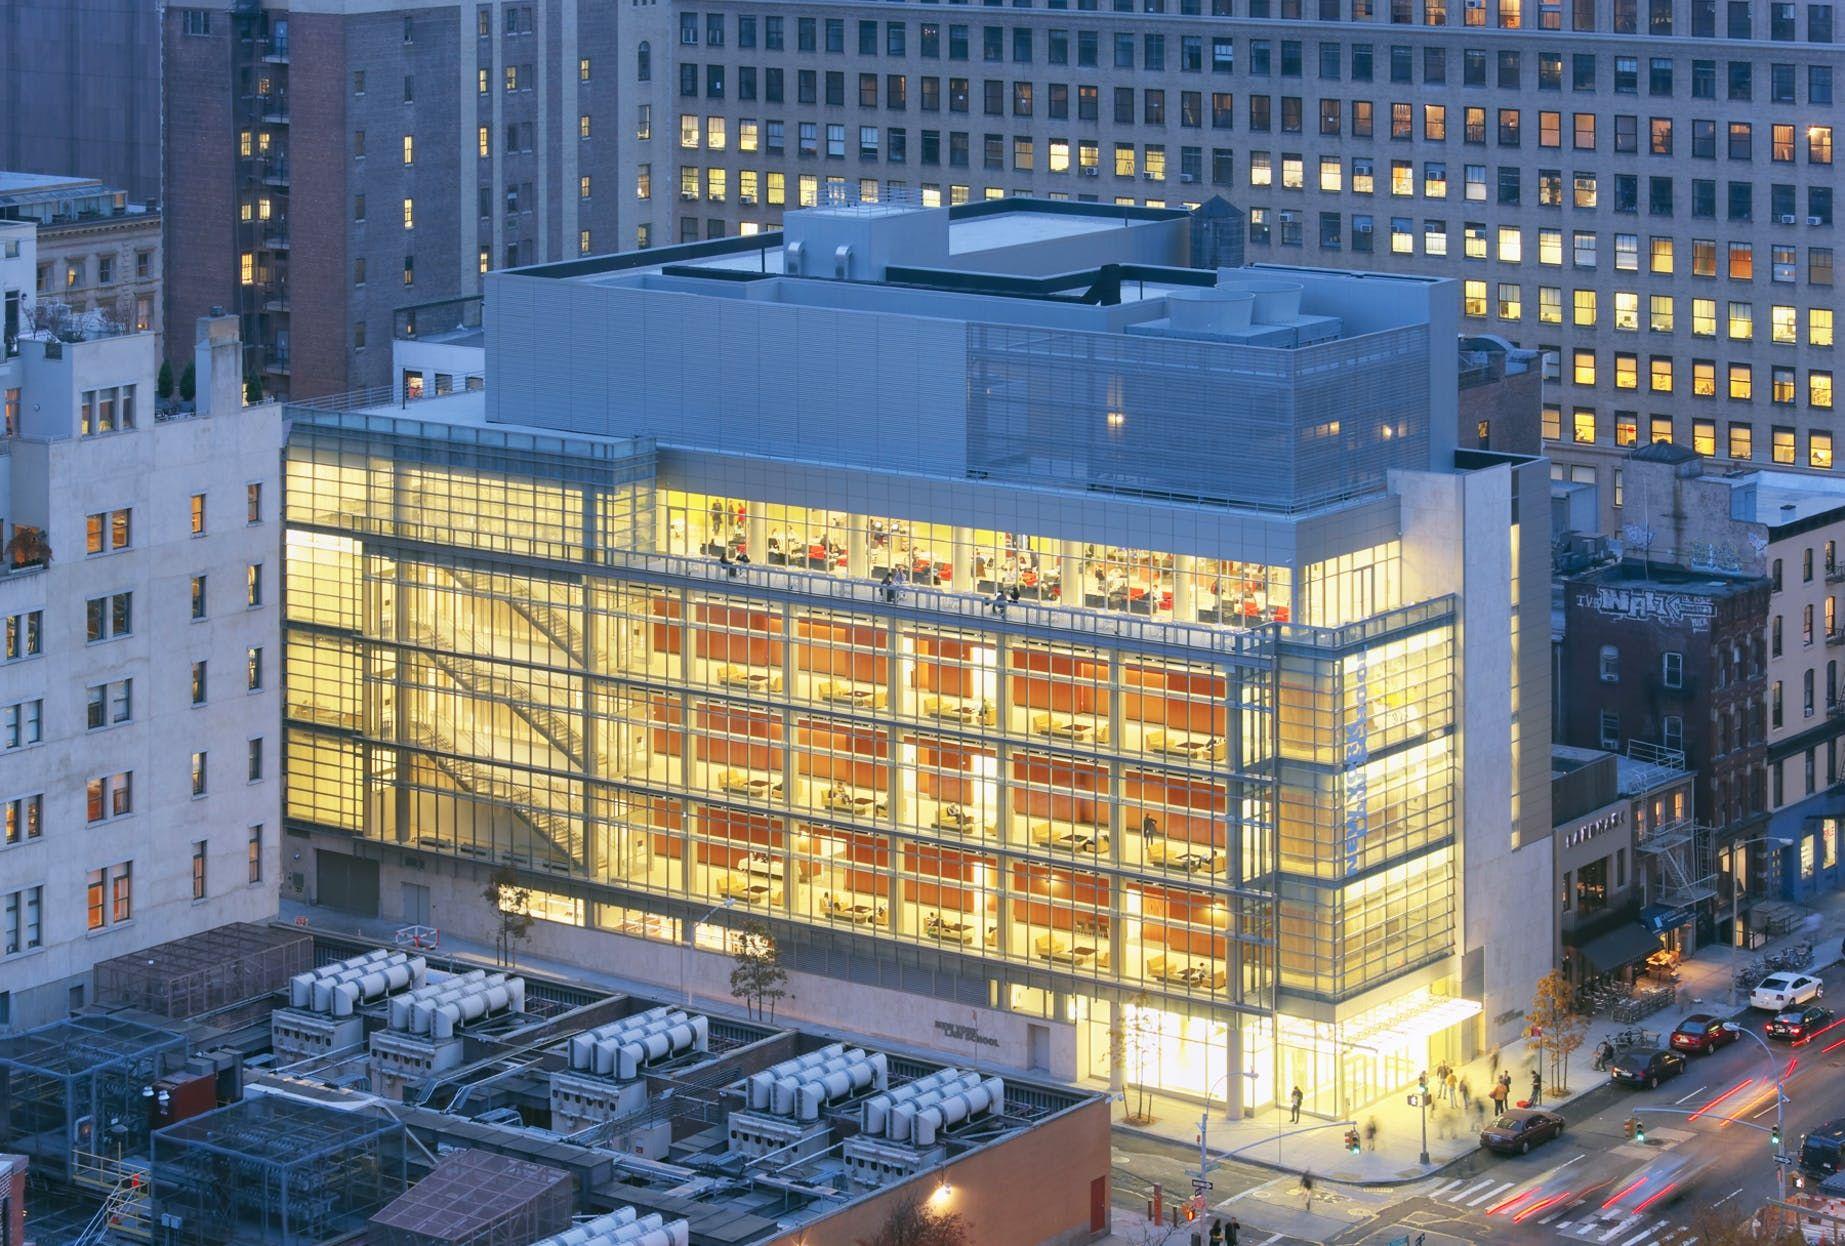 New York Law School Smithgroup Mitch Crowder Archinect Law School New York School